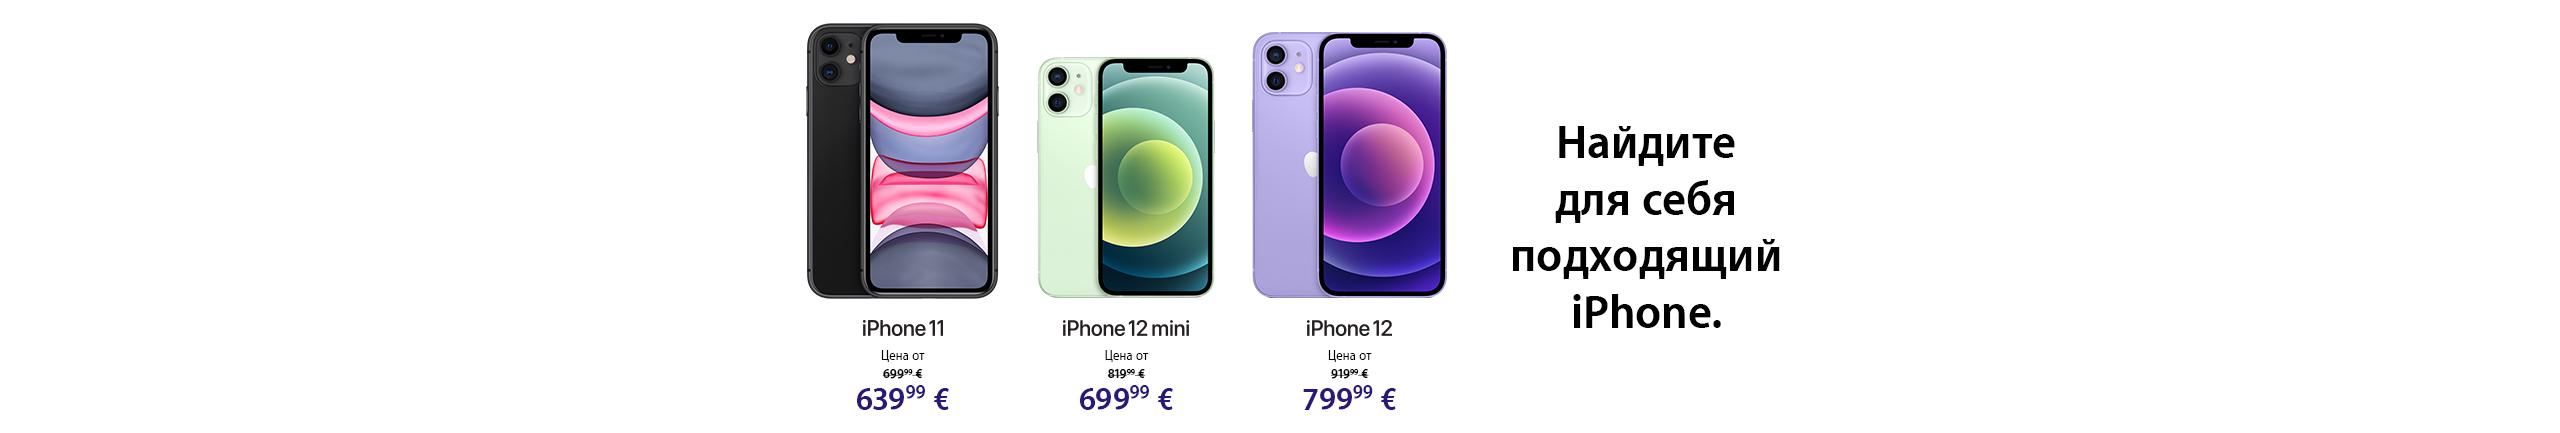 FPS Cпециальное предлощение Apple iPhone 11, iPhone 12 и iPhone 12 Mini